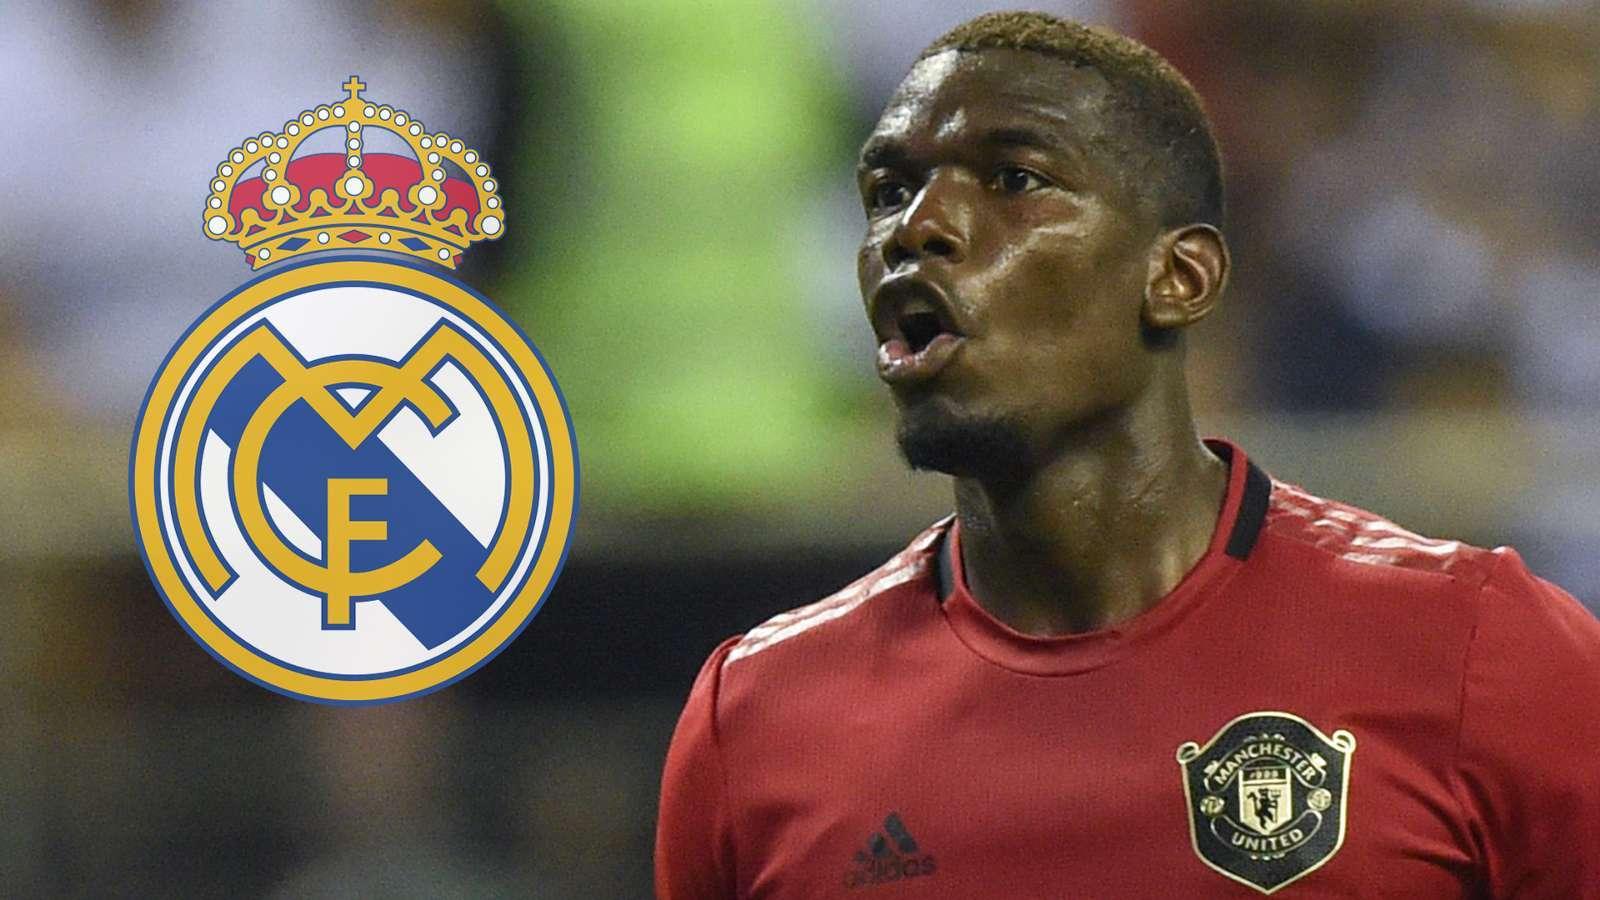 Thể thao 24h:Sergio Ramos mở toang cửa Pogba sang Real Madrid